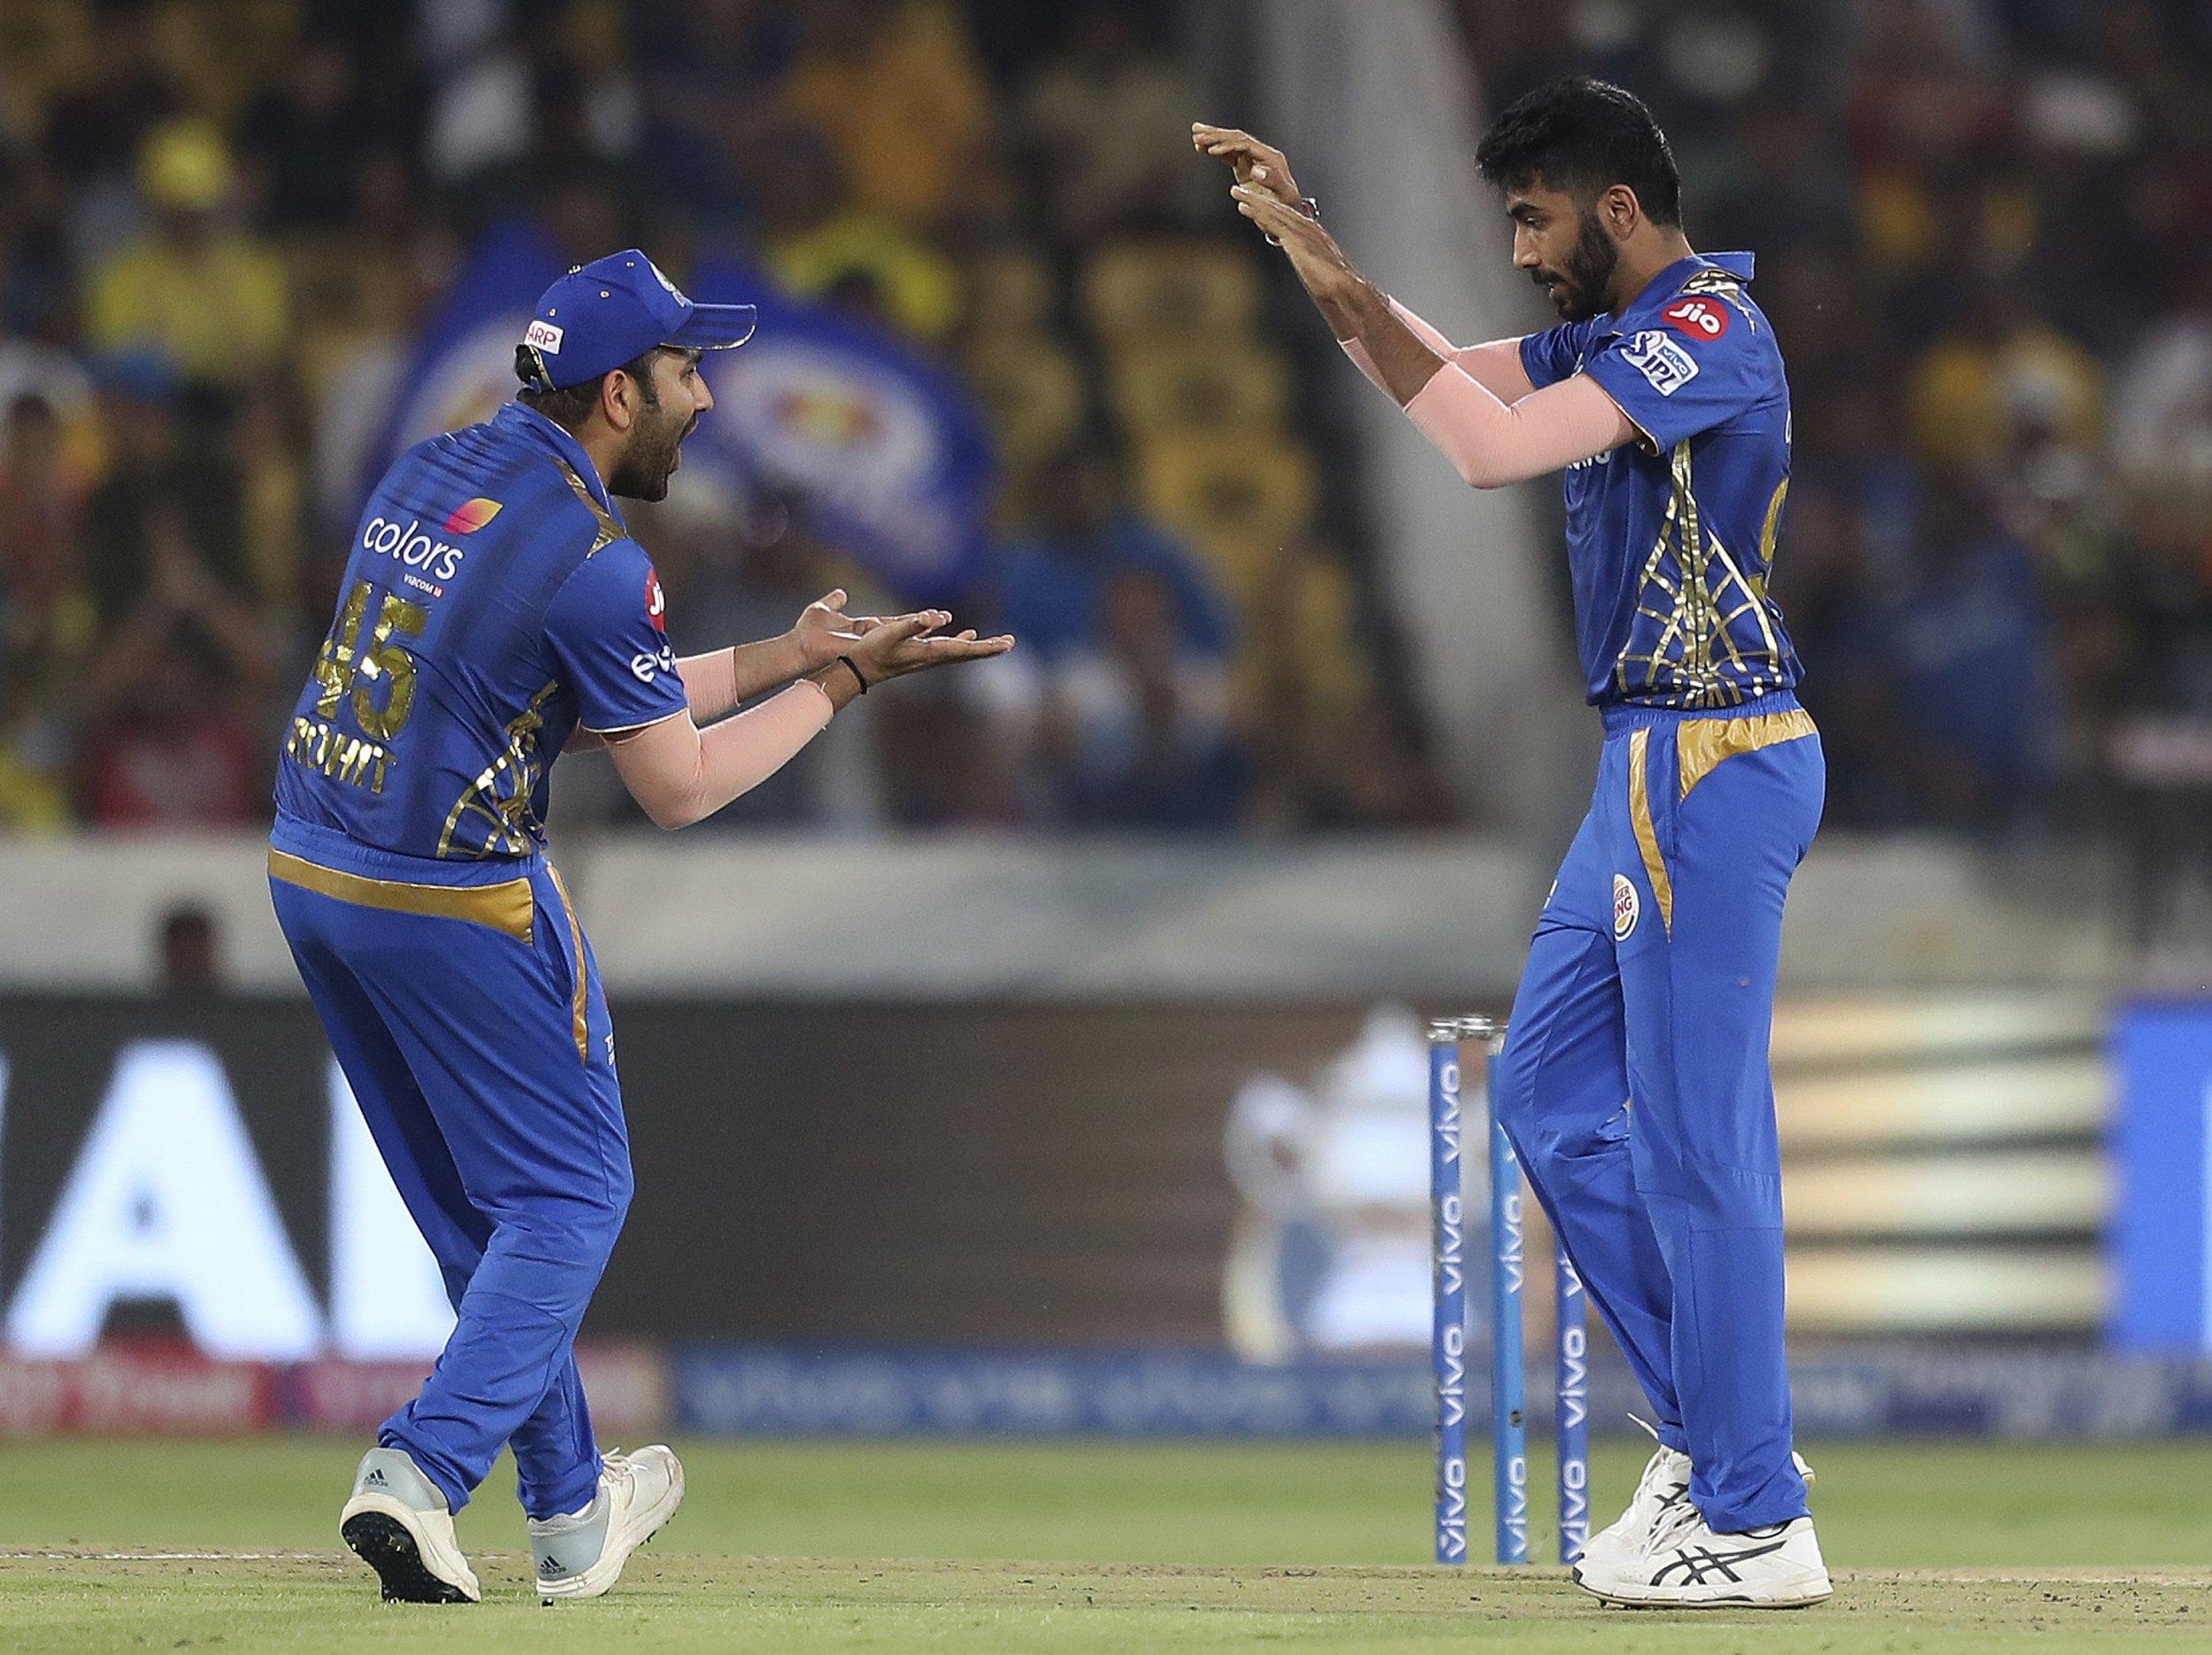 Mumbai Indians Jasprit Bumrah, right, celebrates with captain Rohit Sharma after the dismissal of Chennai Super King's Ambati Rayudu during the VIVO IPL T20 cricket final match in Hyderabad, India, Sunday, May 12, 2019. (AP Photo/ Mahesh Kumar A.)